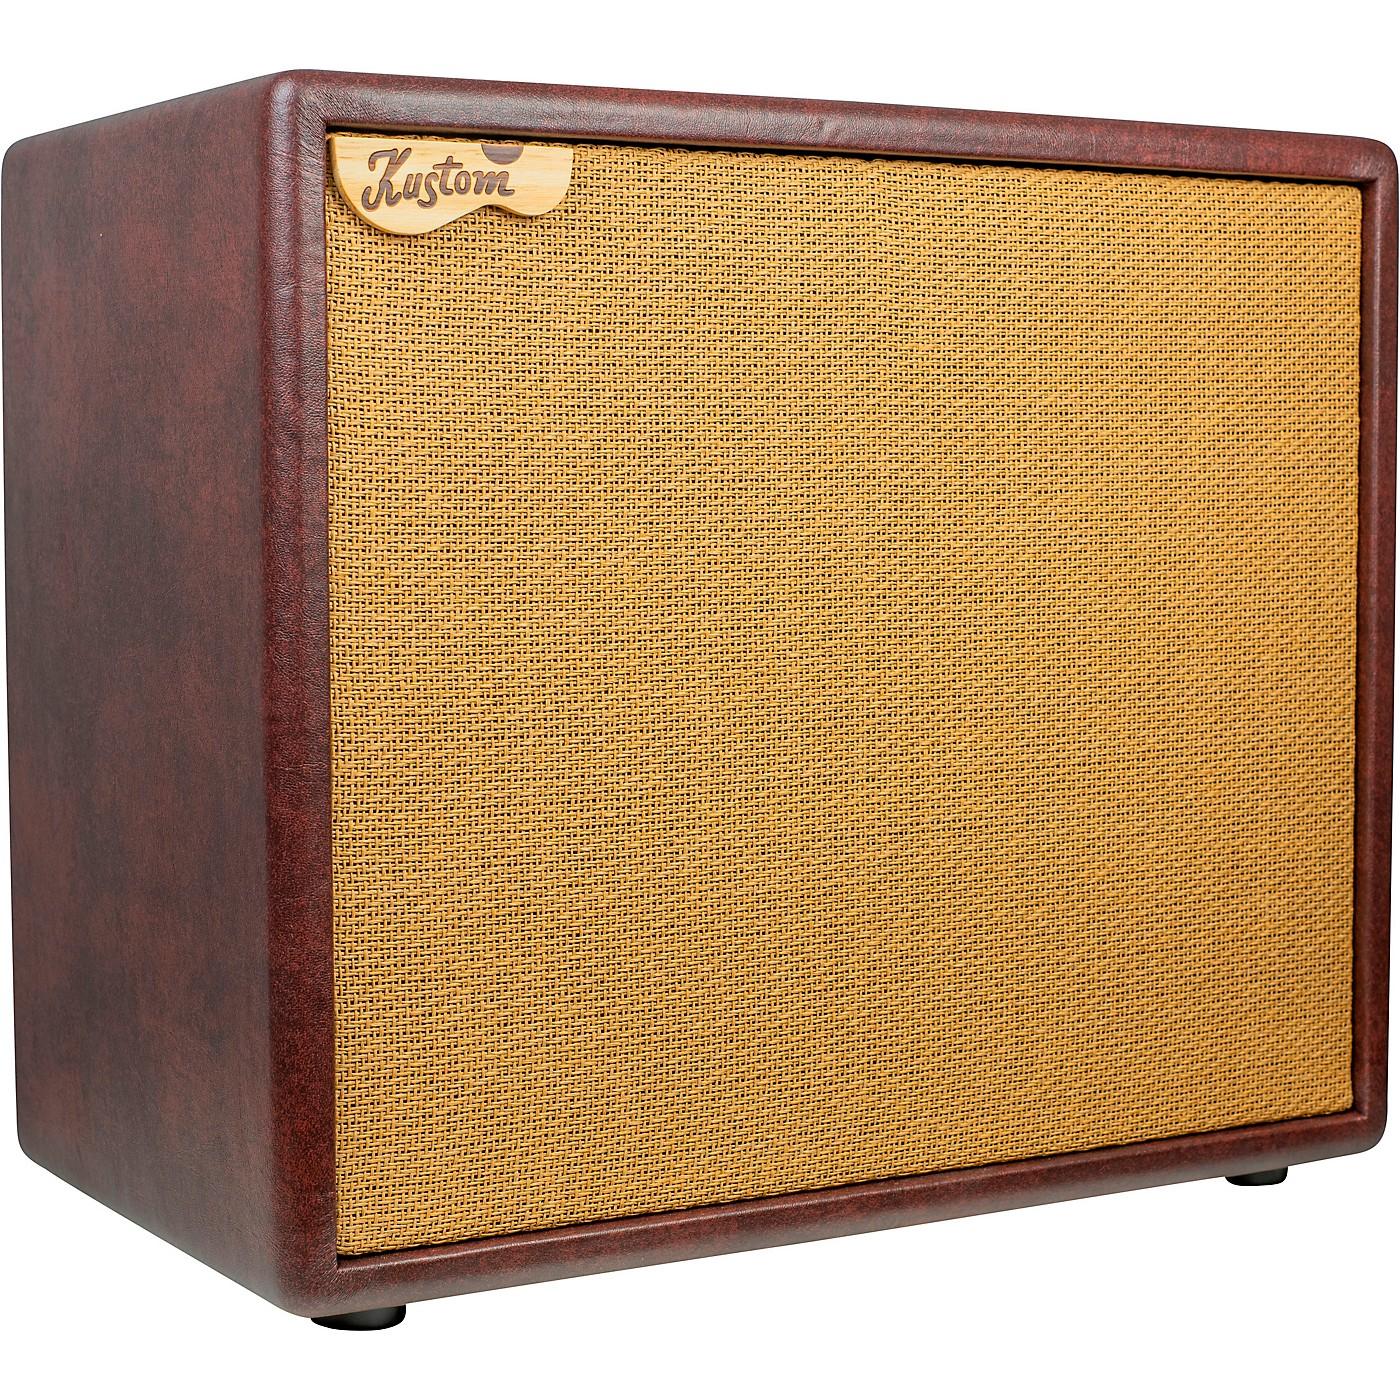 Kustom Sienna Pro 65 65W 1x12 Acoustic Combo Amplifier thumbnail